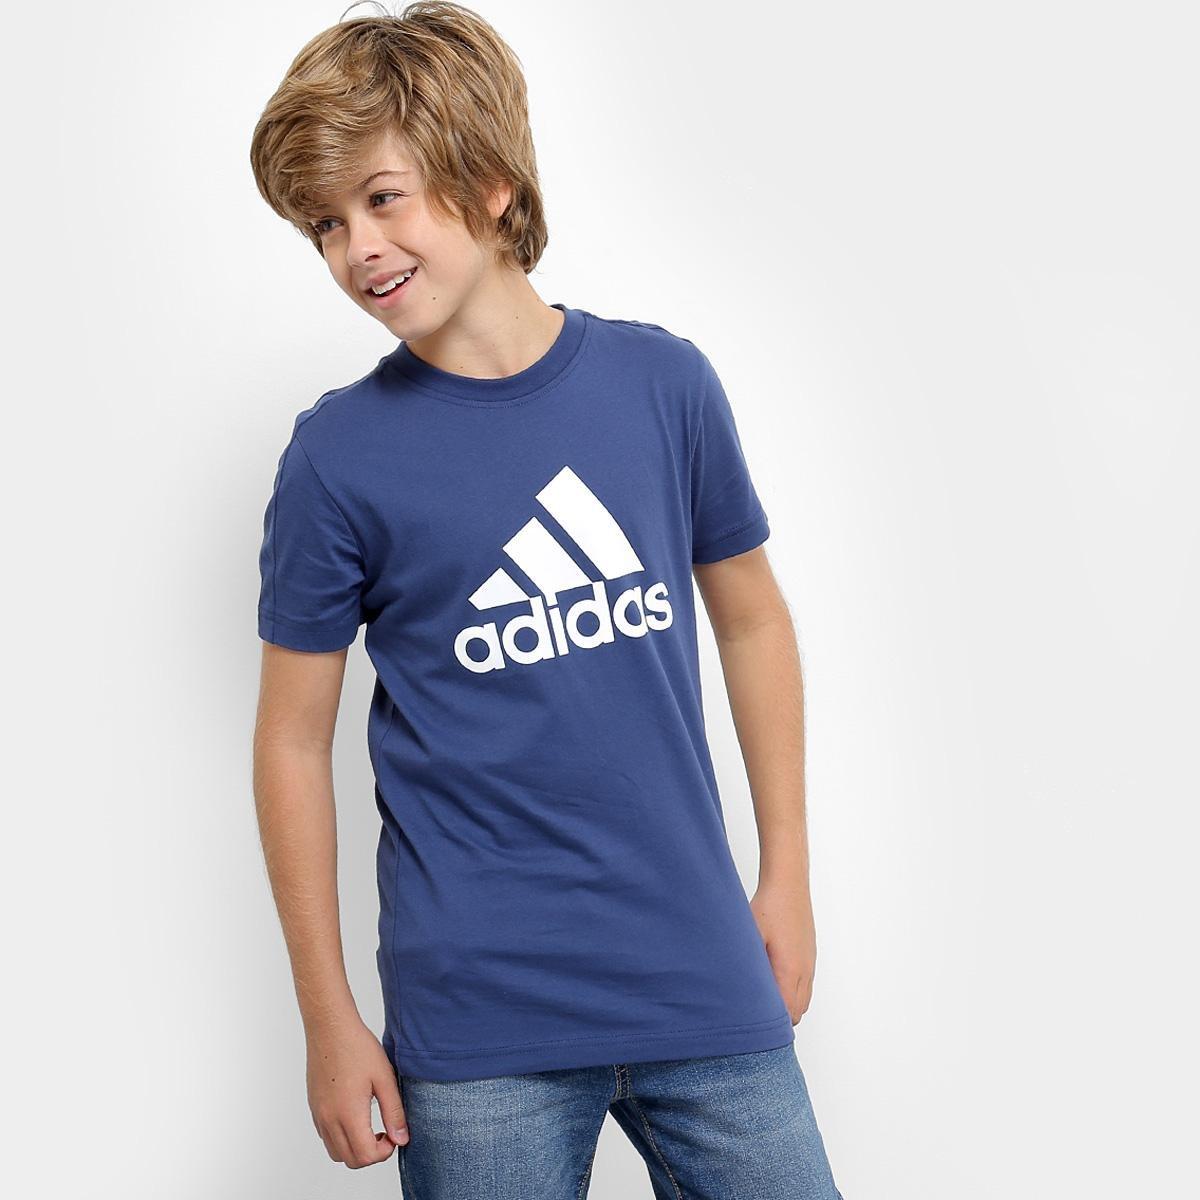 22873a8edf4c9 Camiseta Infantil Adidas Mc Yb Logo Masculina - Compre Agora Netshoes  a947366d0174c5 ...